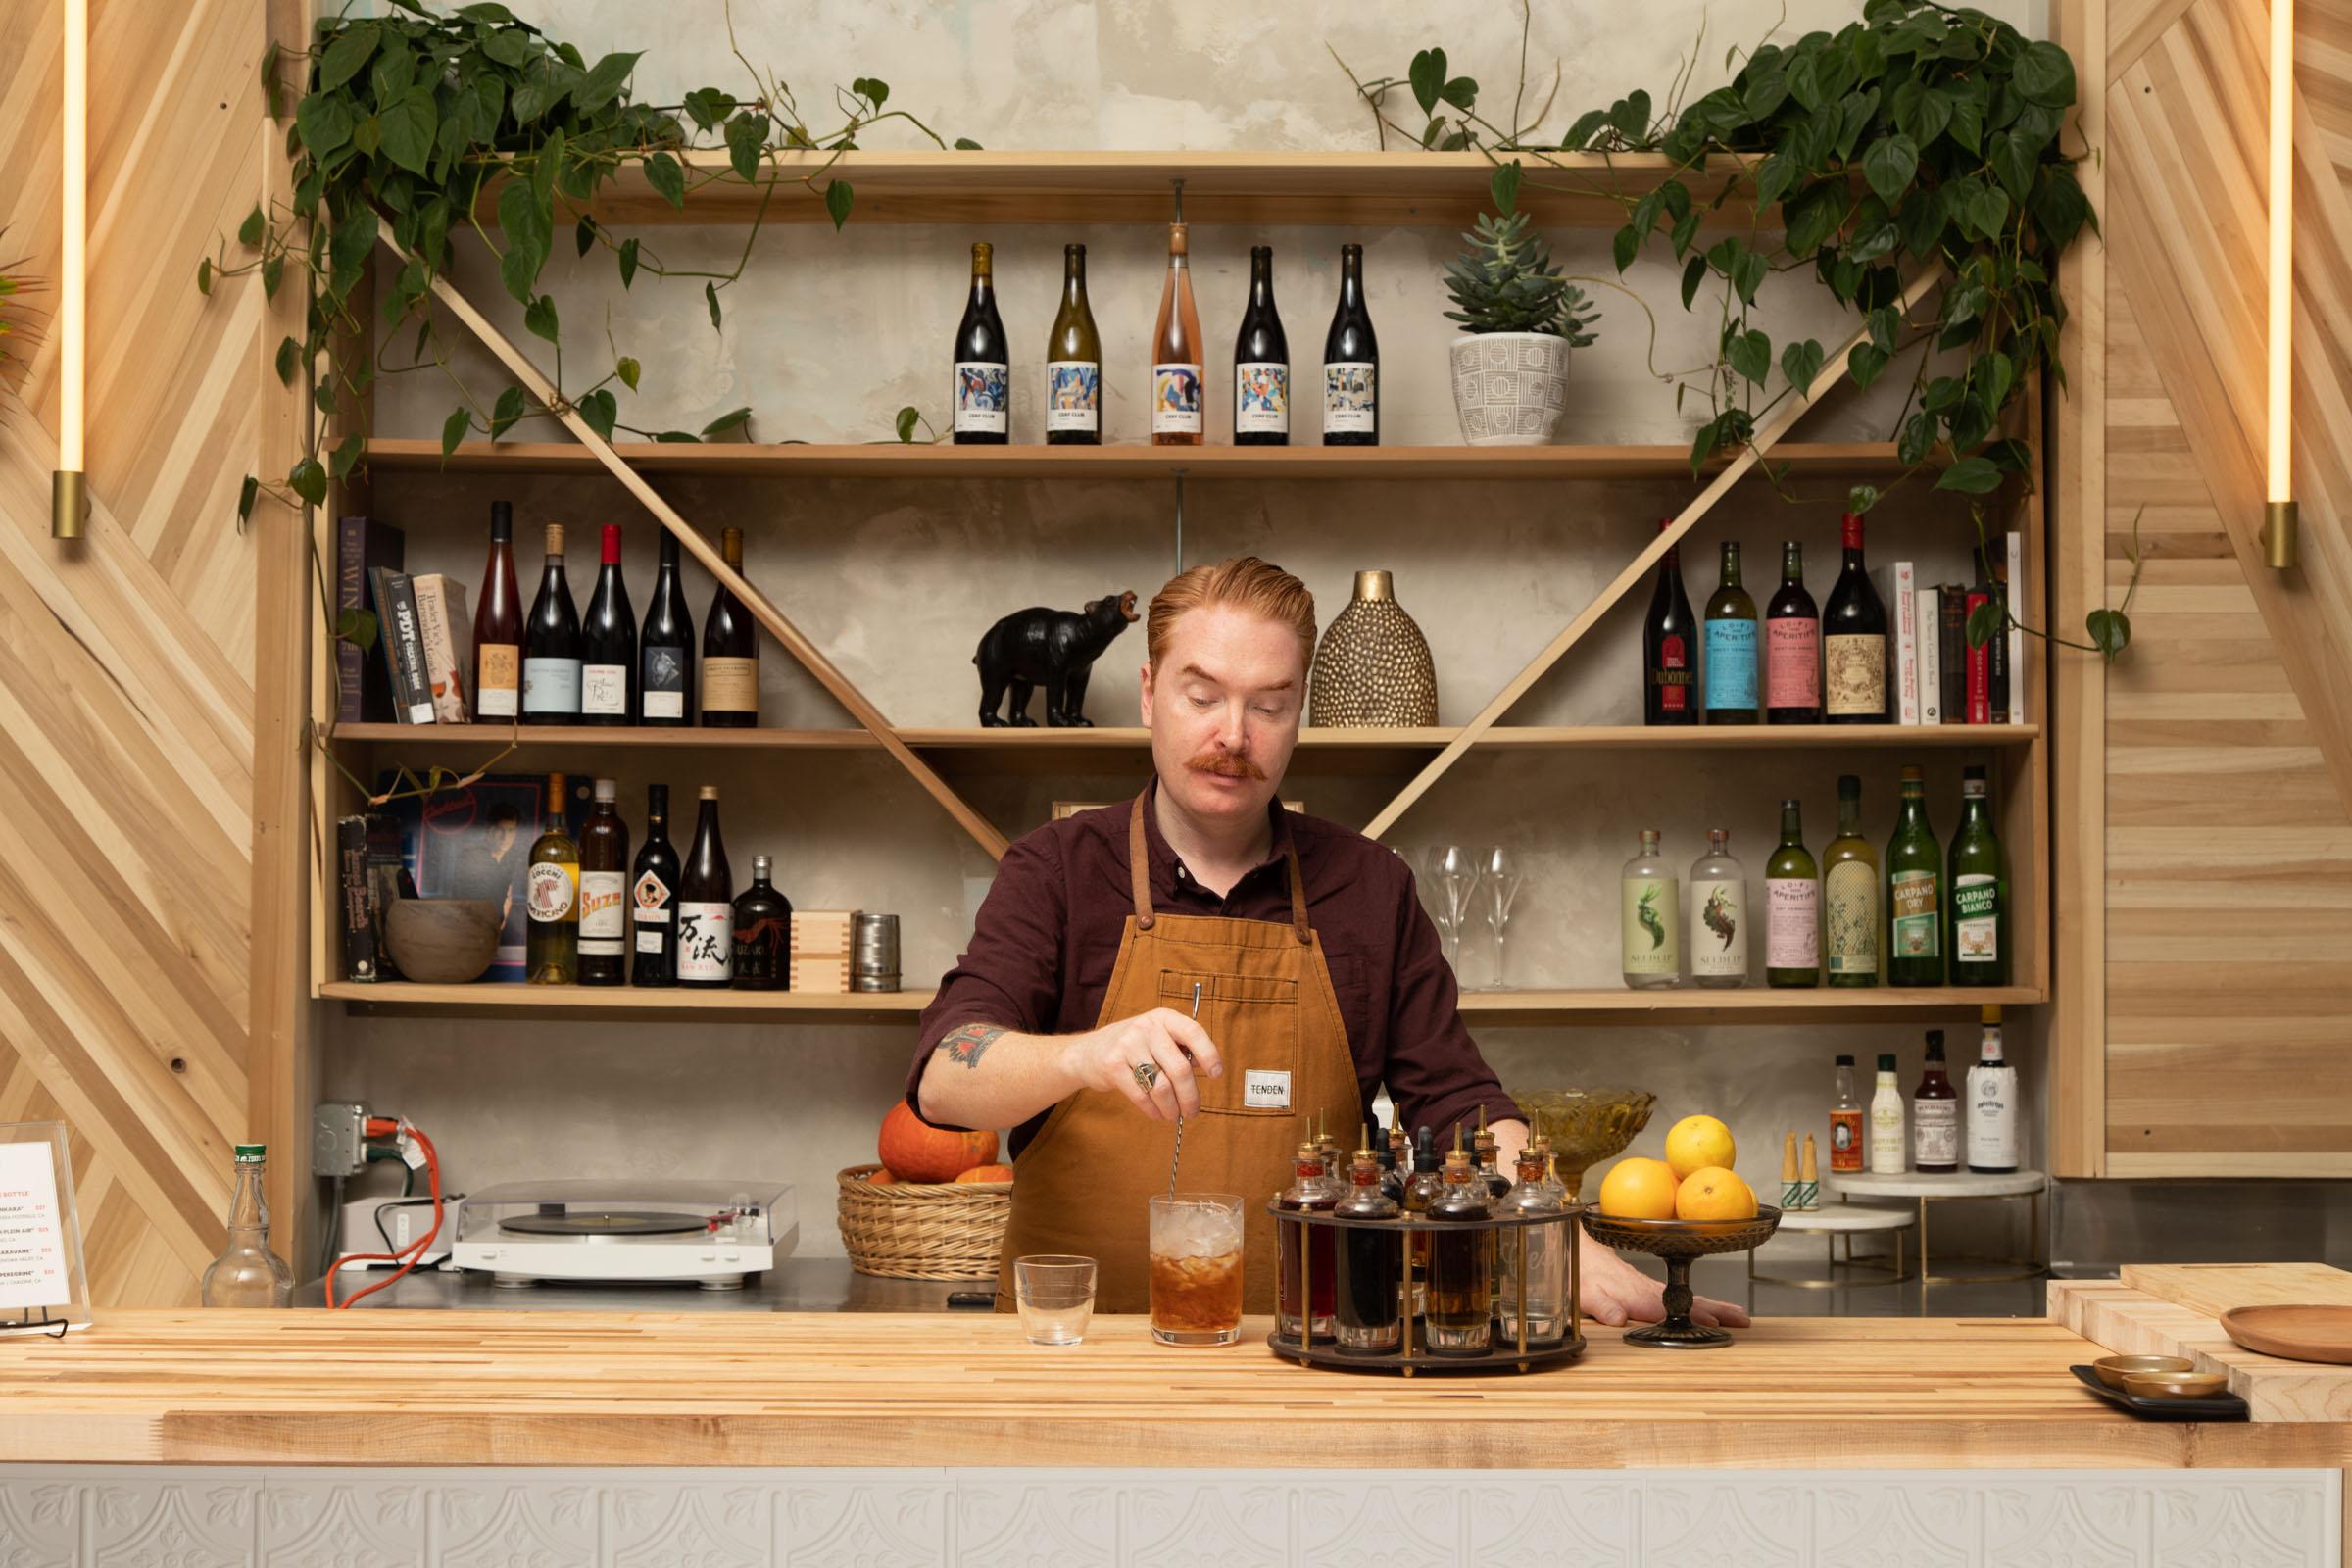 2018-11-29 Derby Cocktail, David Dines-1653.jpg